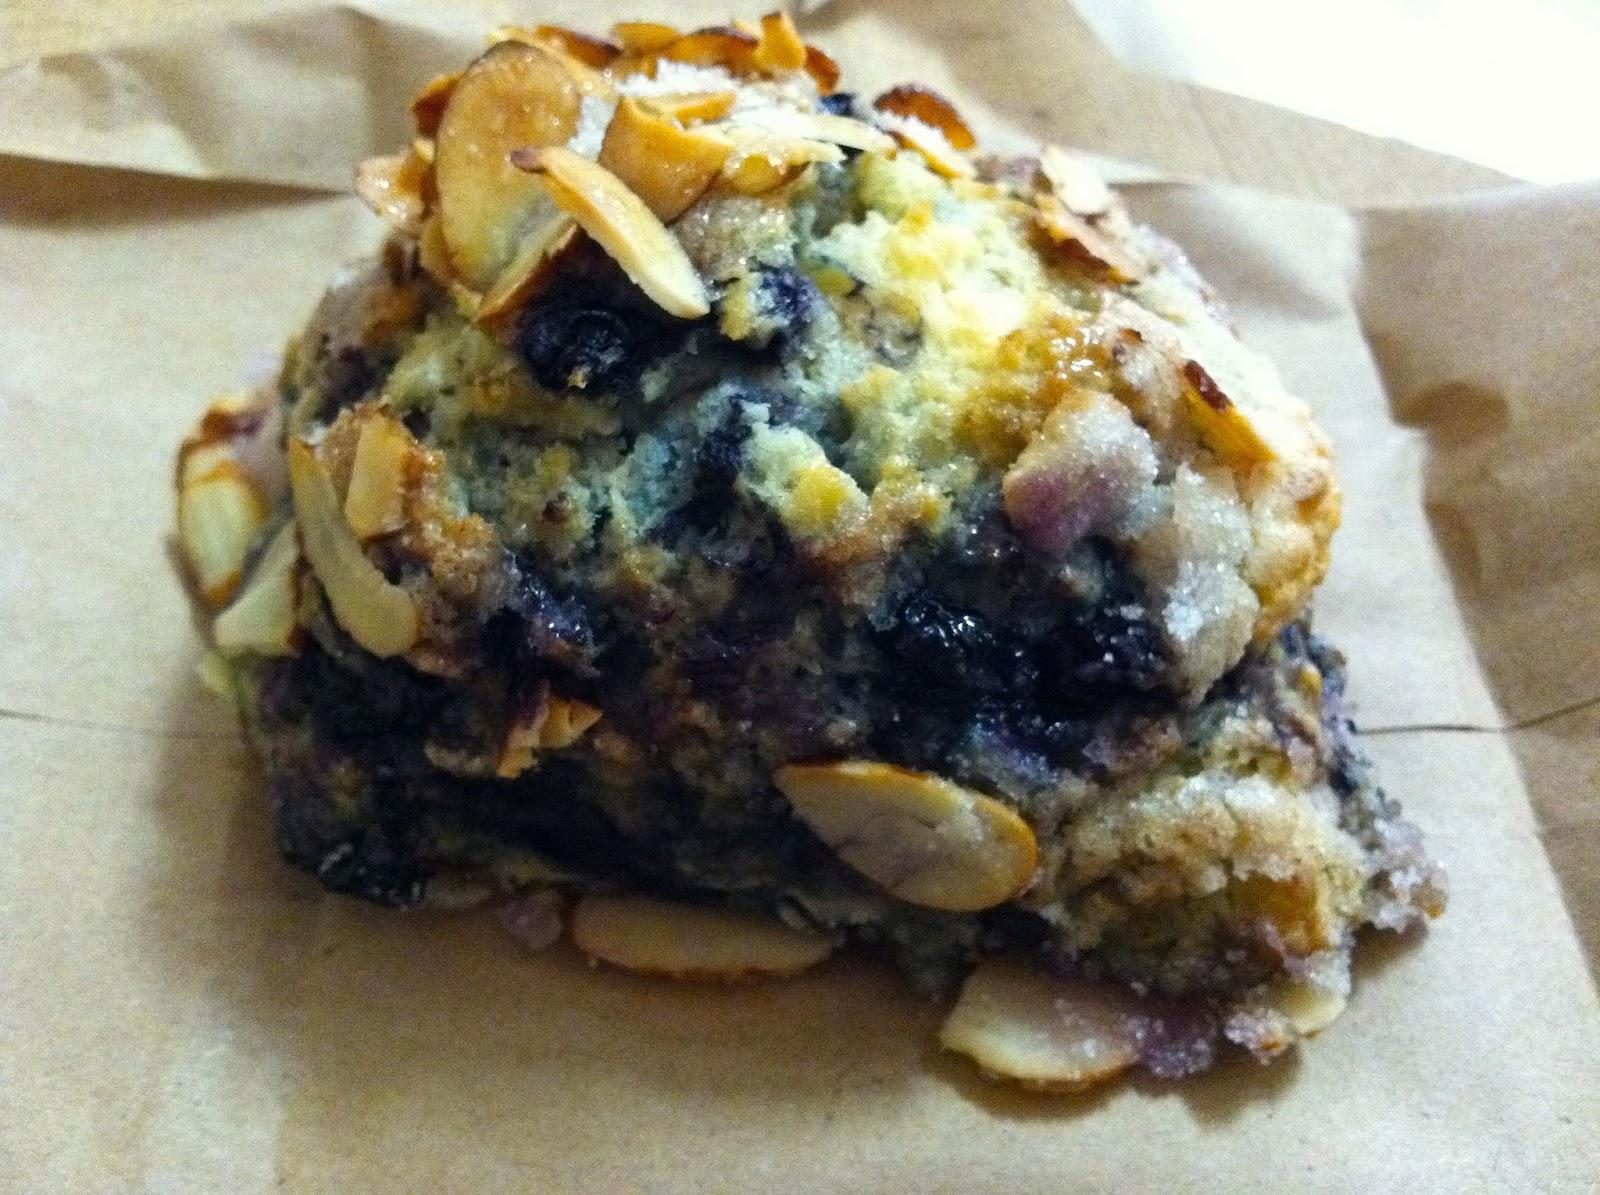 Blueberry Honey Almond Scone